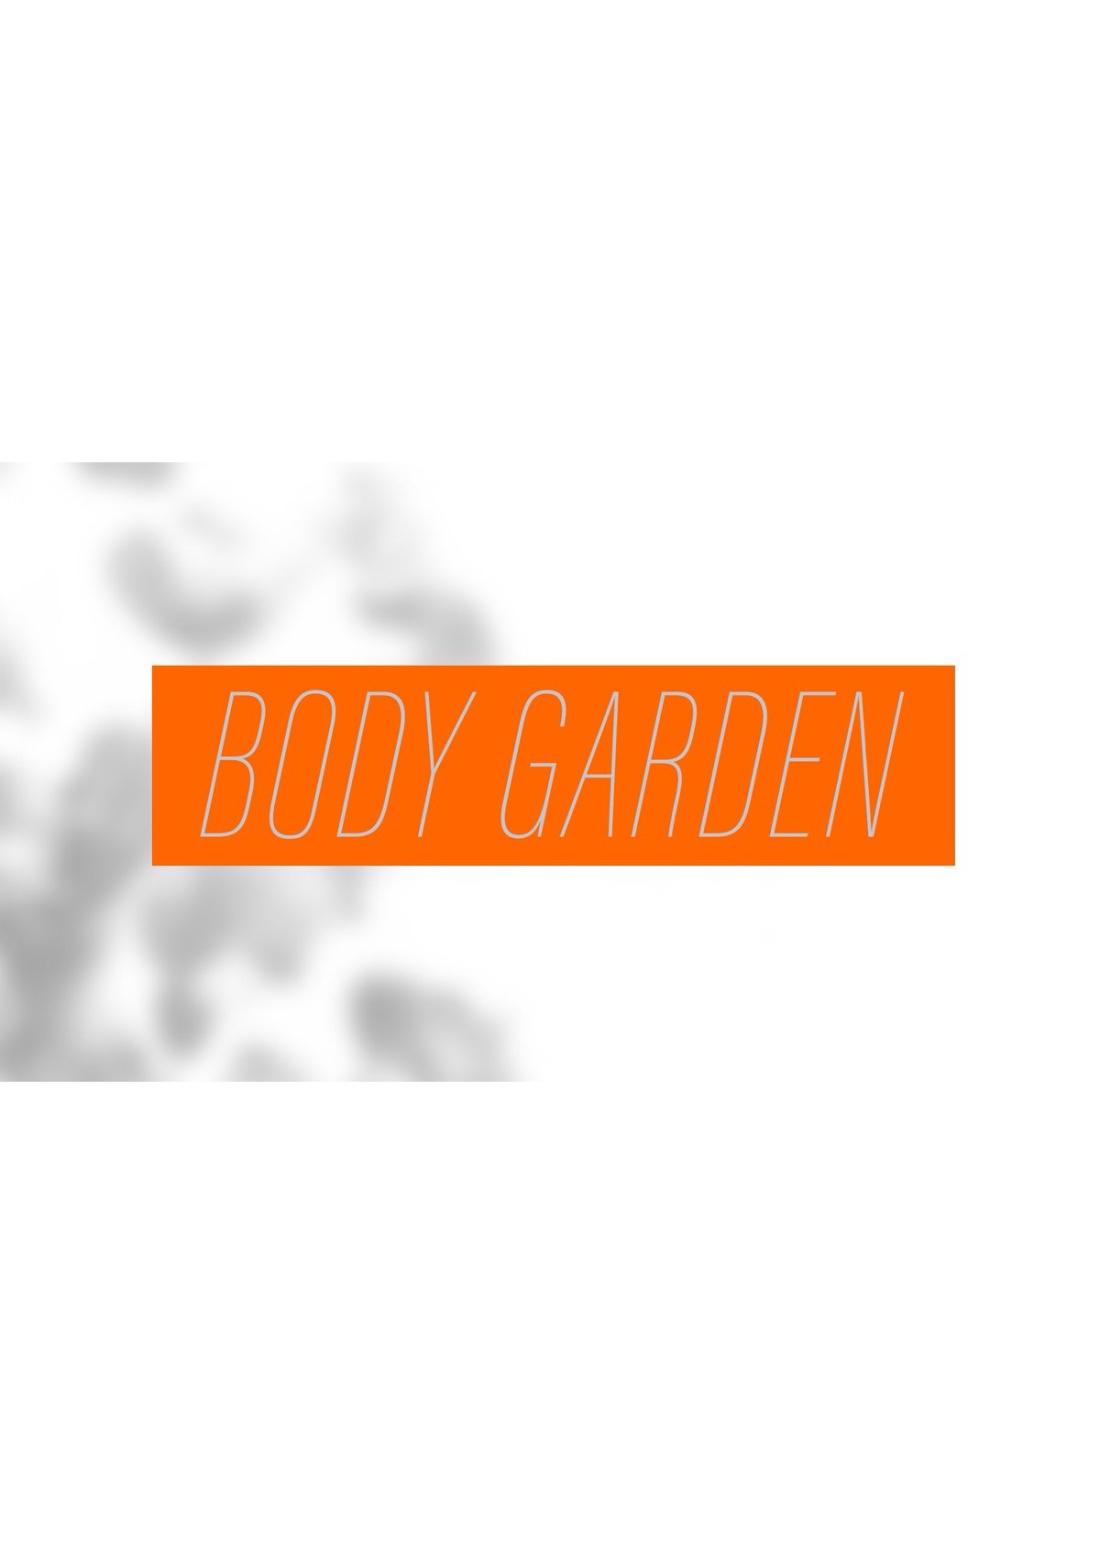 BODY GARDEN